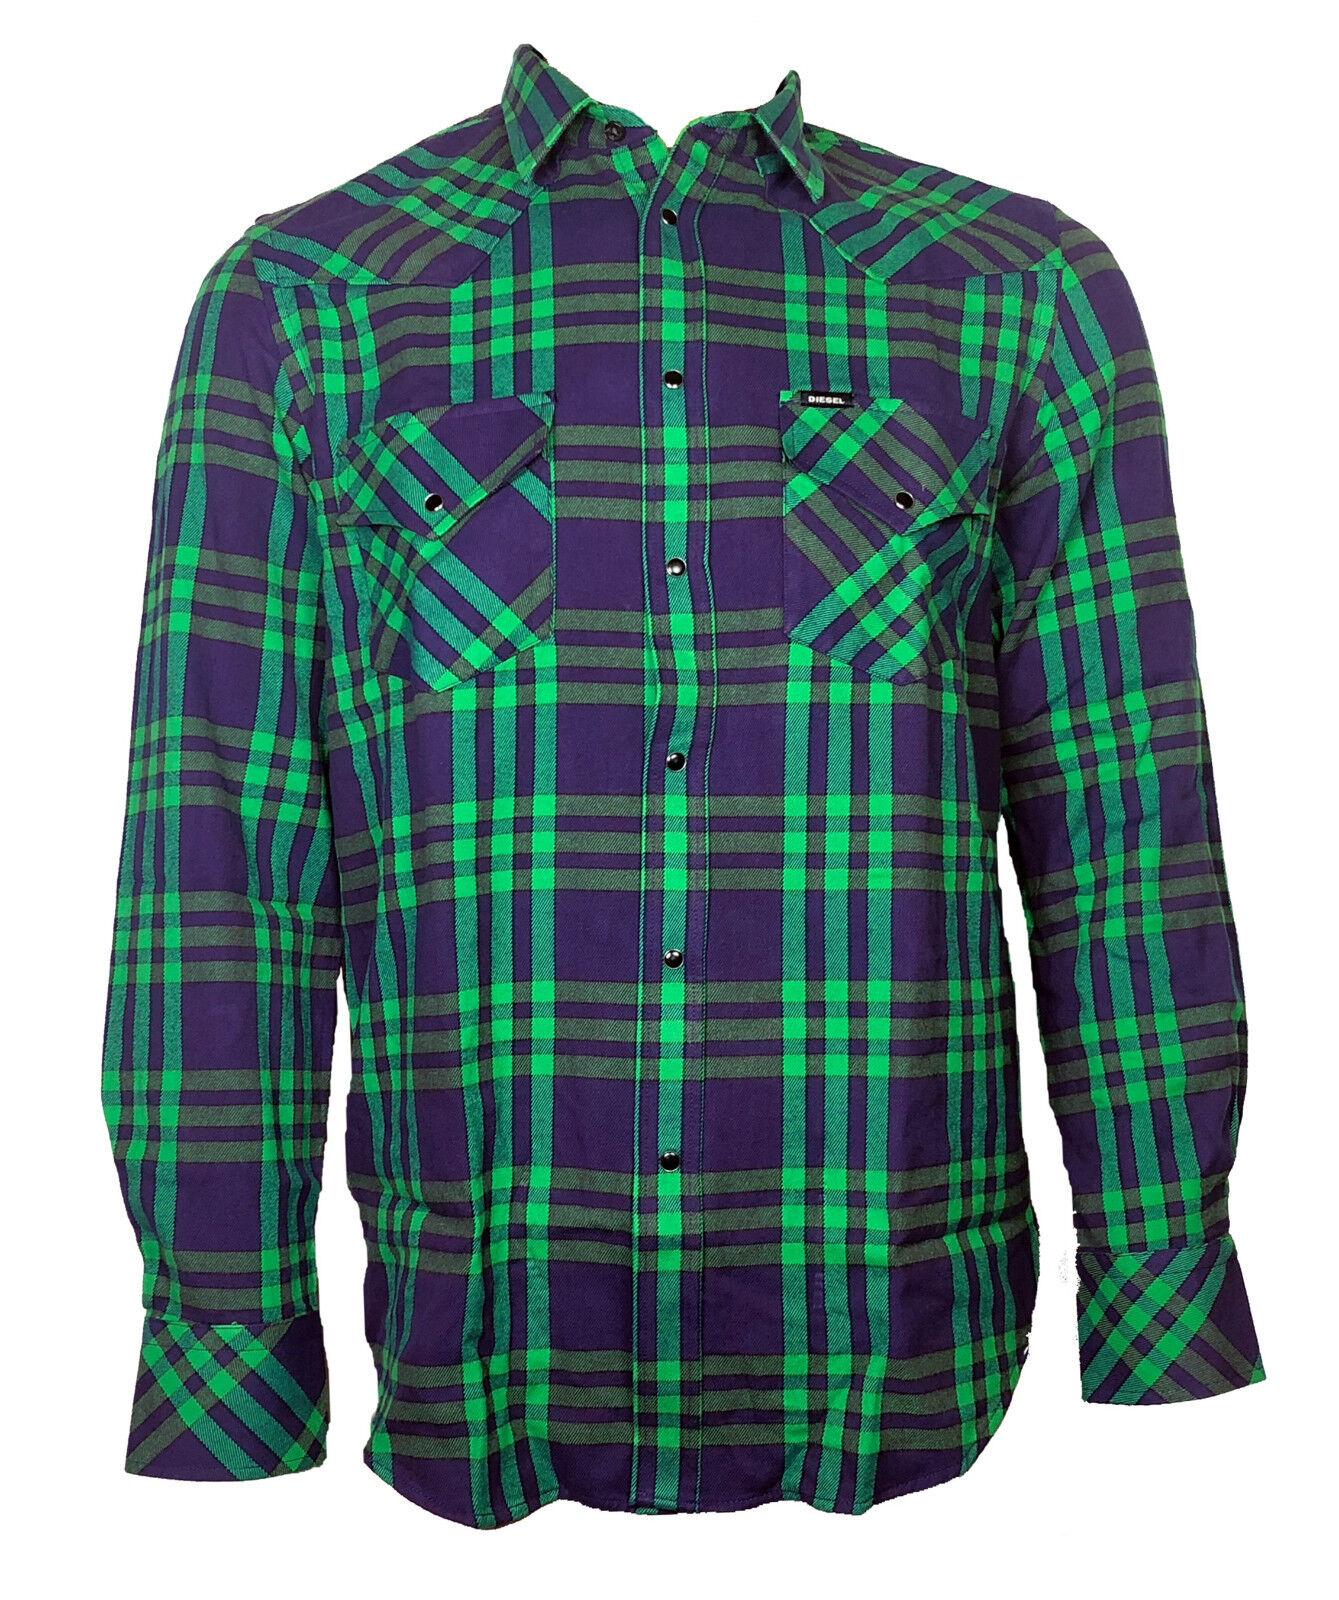 DIESEL Herren langarm Hemd     EAST-LONG  blau grün kariert  Gr. L  NEU | Fairer Preis  8ee5c1